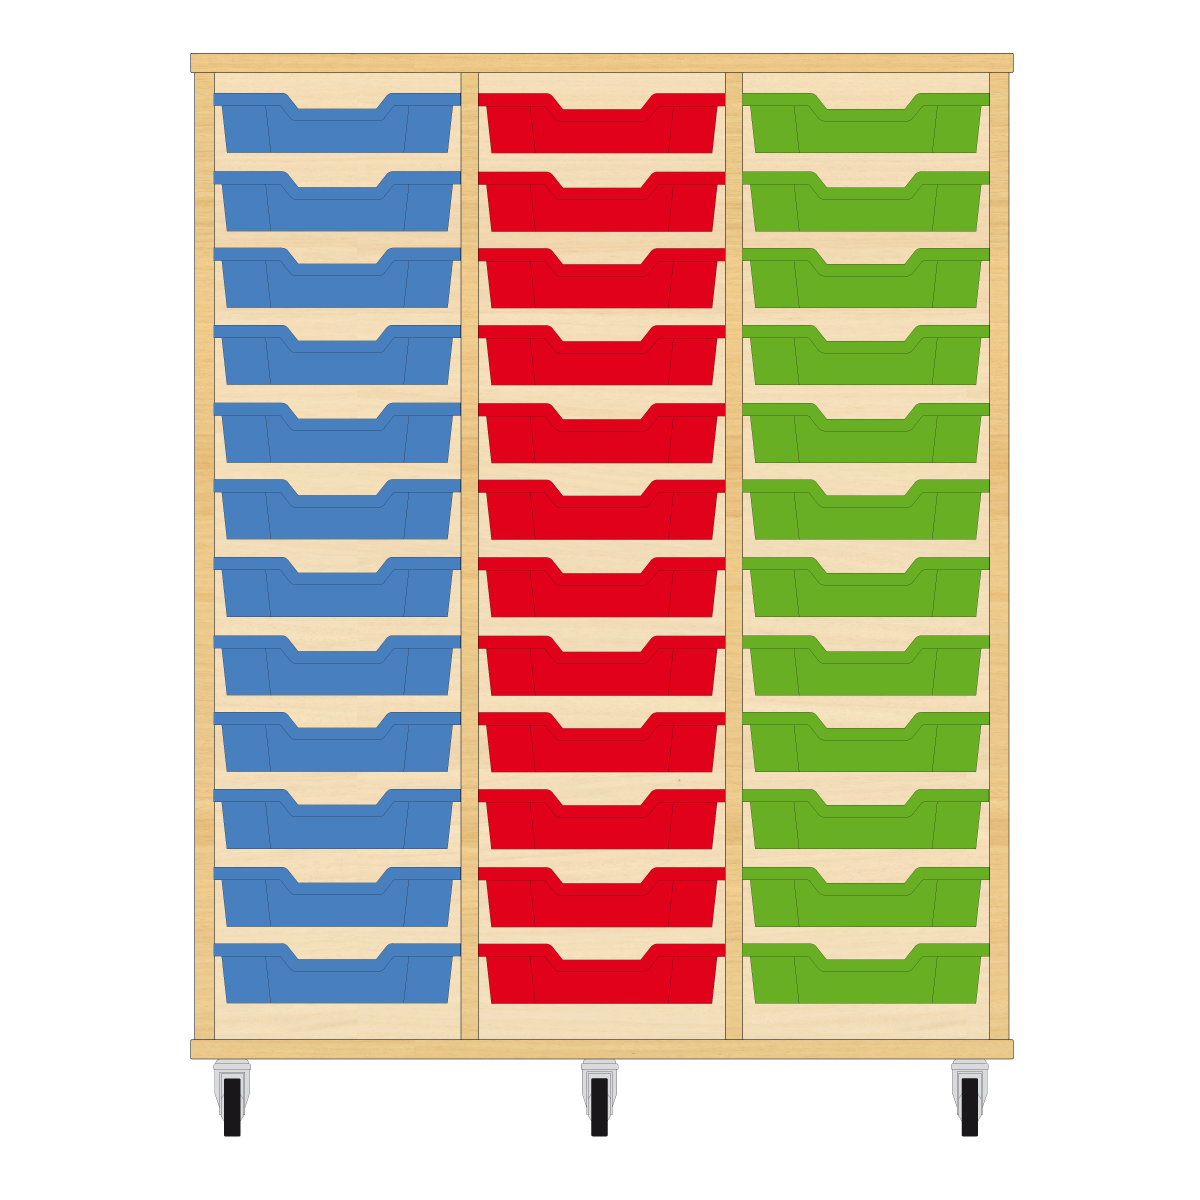 Storix Eigendomskast beuken 3 kol. 12 laden blauw-rood-groen